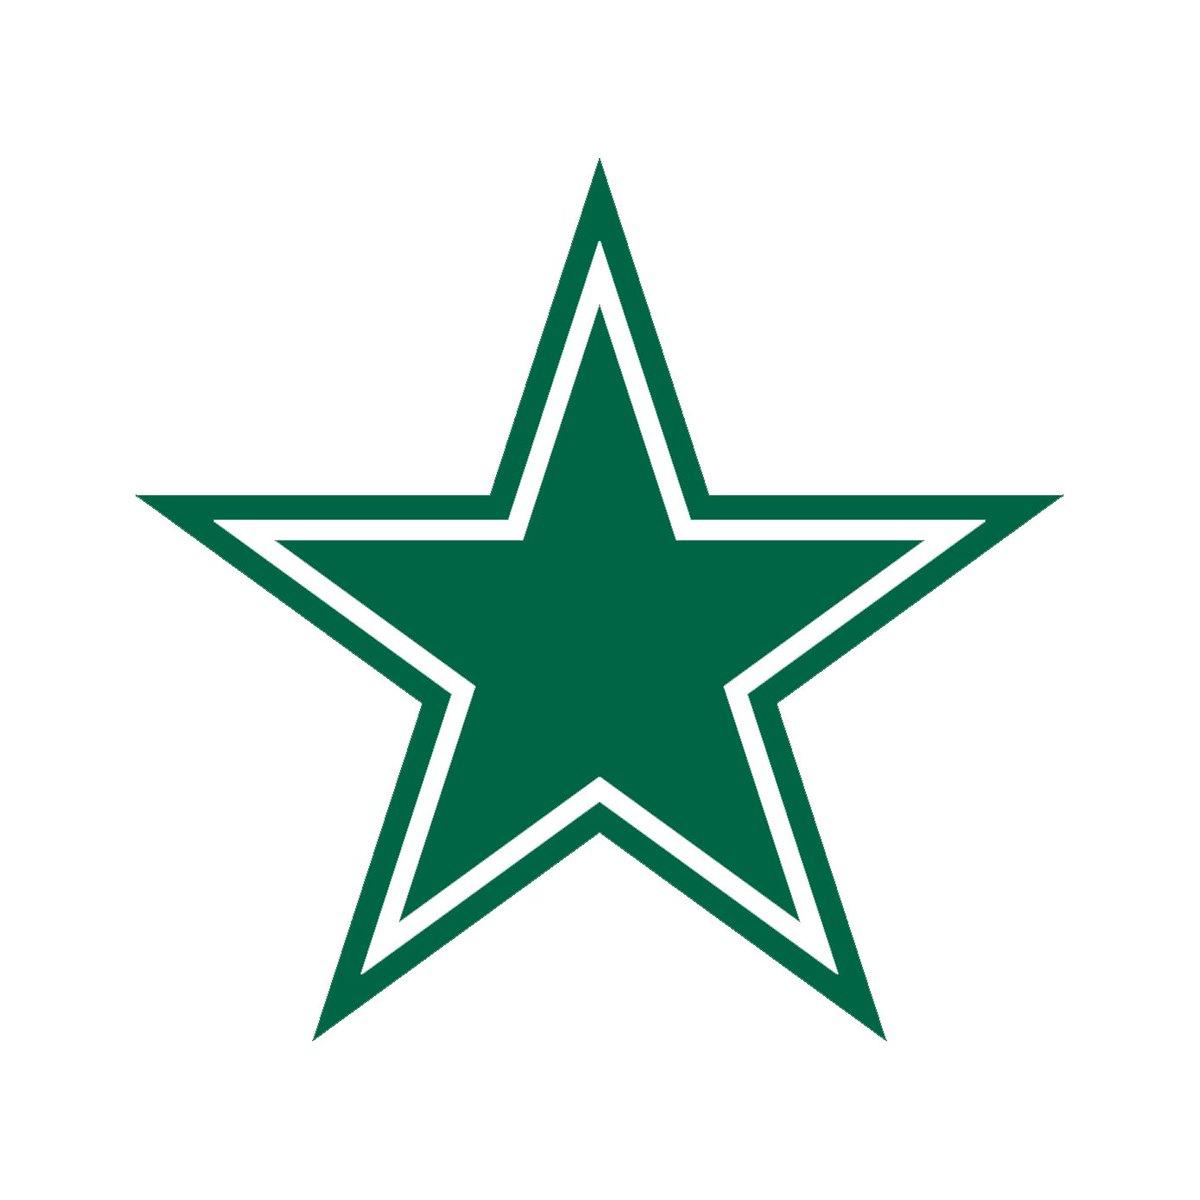 RT @DallasStars: new logo. hope this is cool, @dallascowboys https://t.co/cCBPHjqWxP